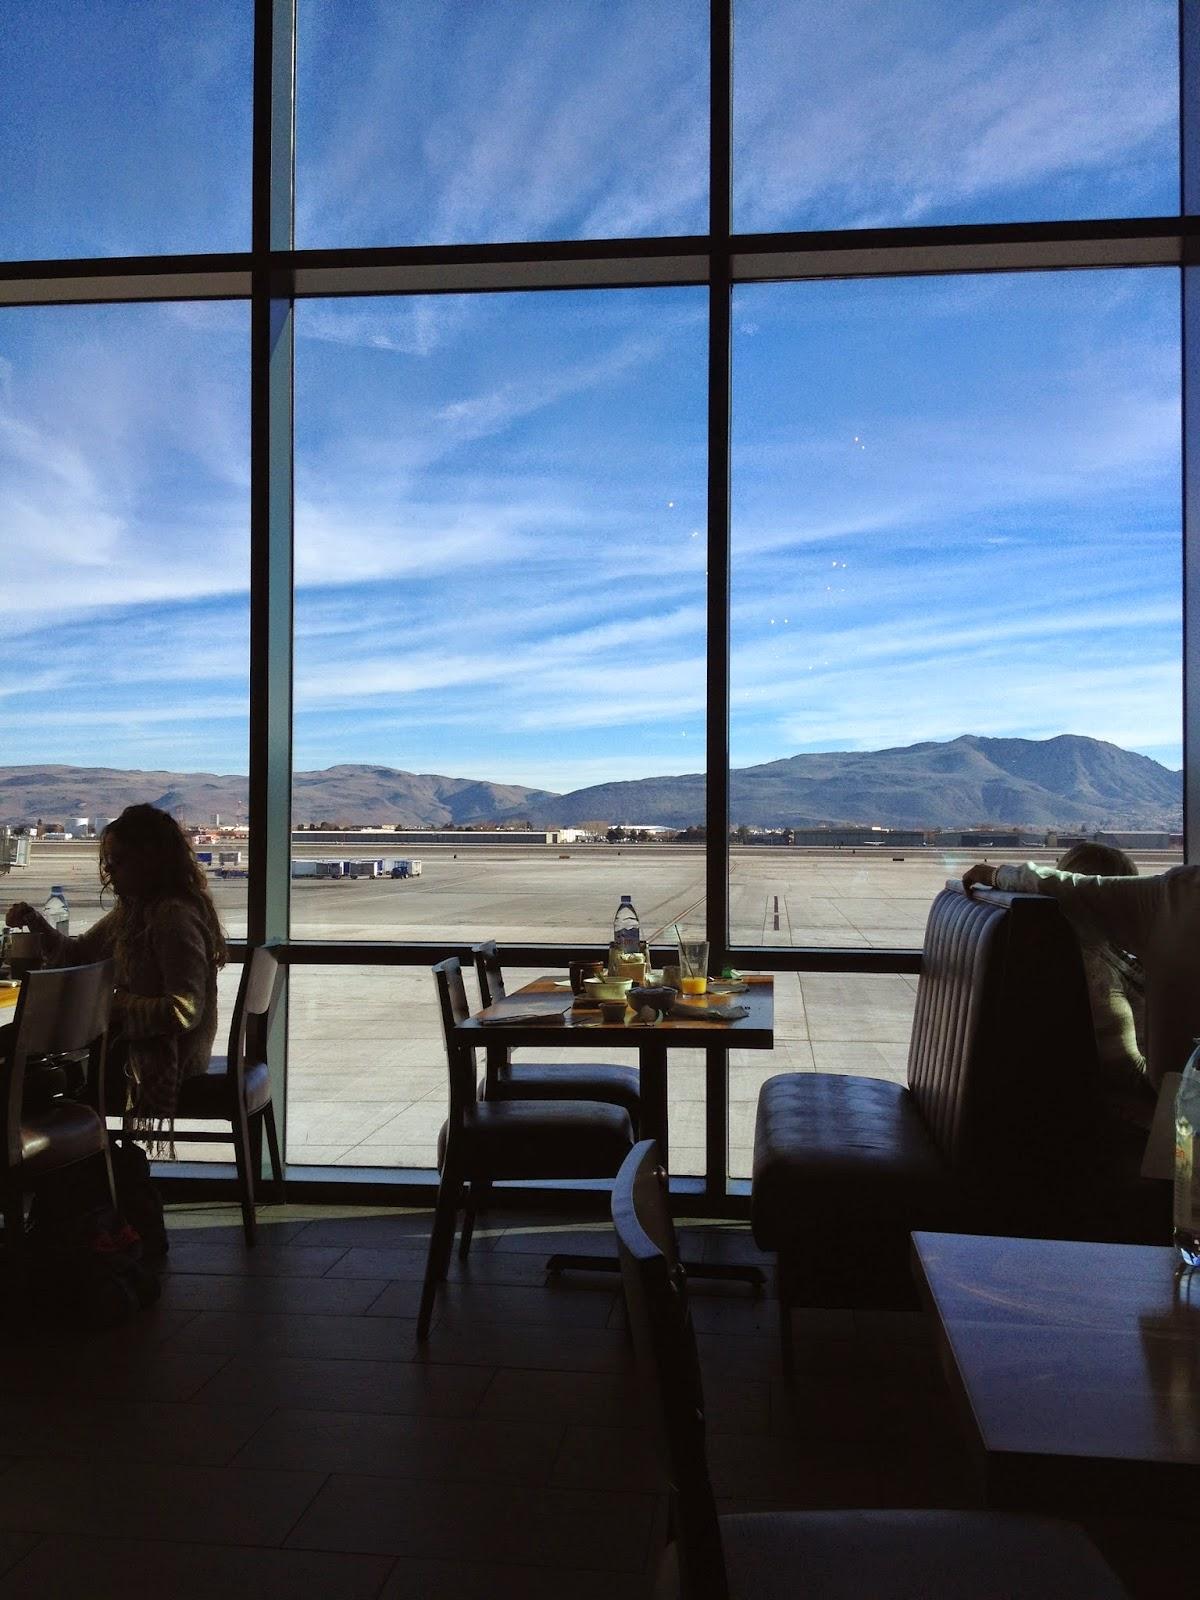 Timber Ridge Restaurant in the Reno Tahoe Airport